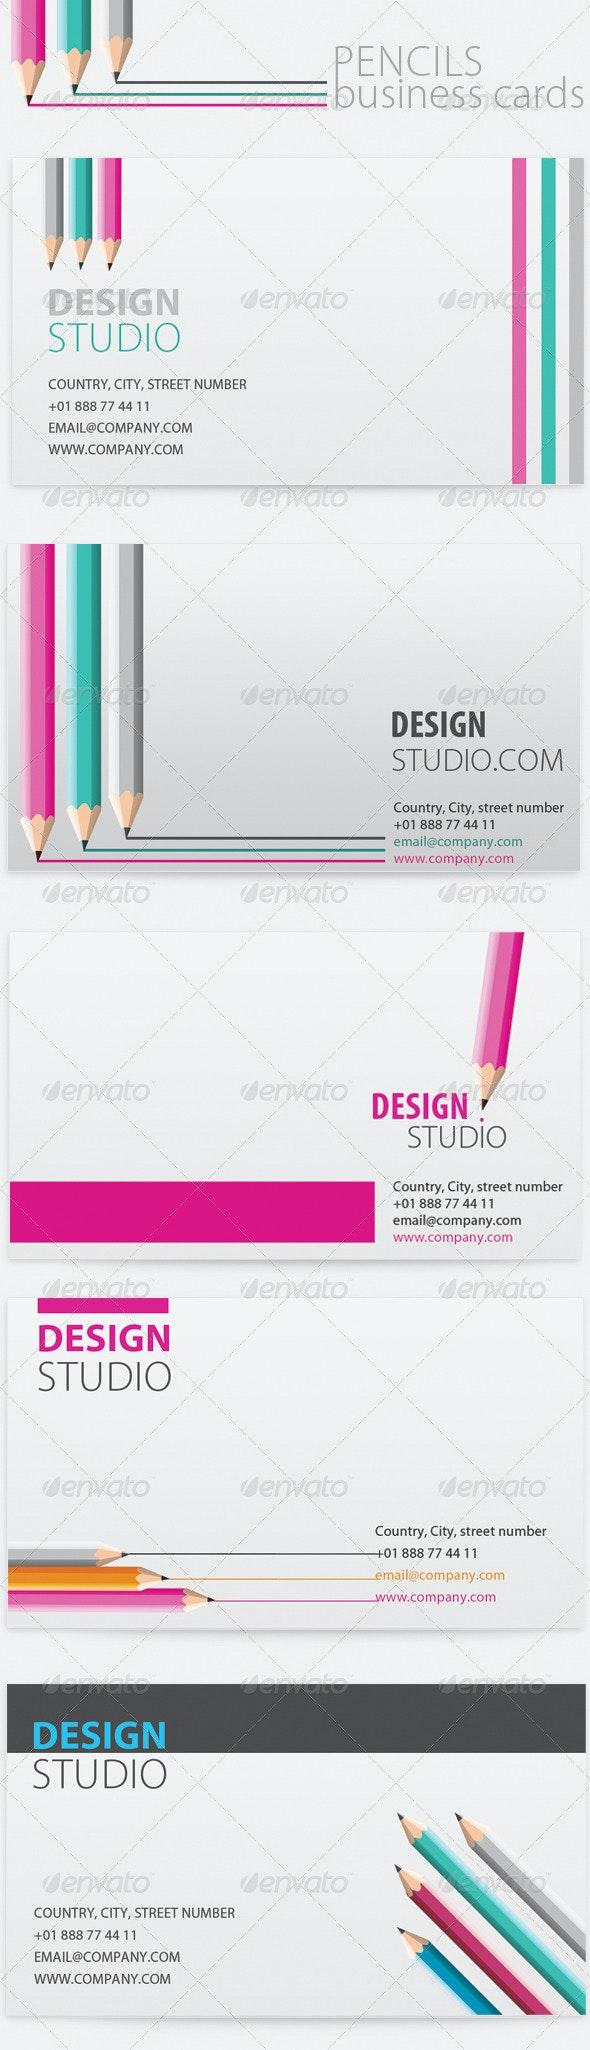 5 x Pencil Business Cards for Artist / Designer / Writer - Creative Business Cards